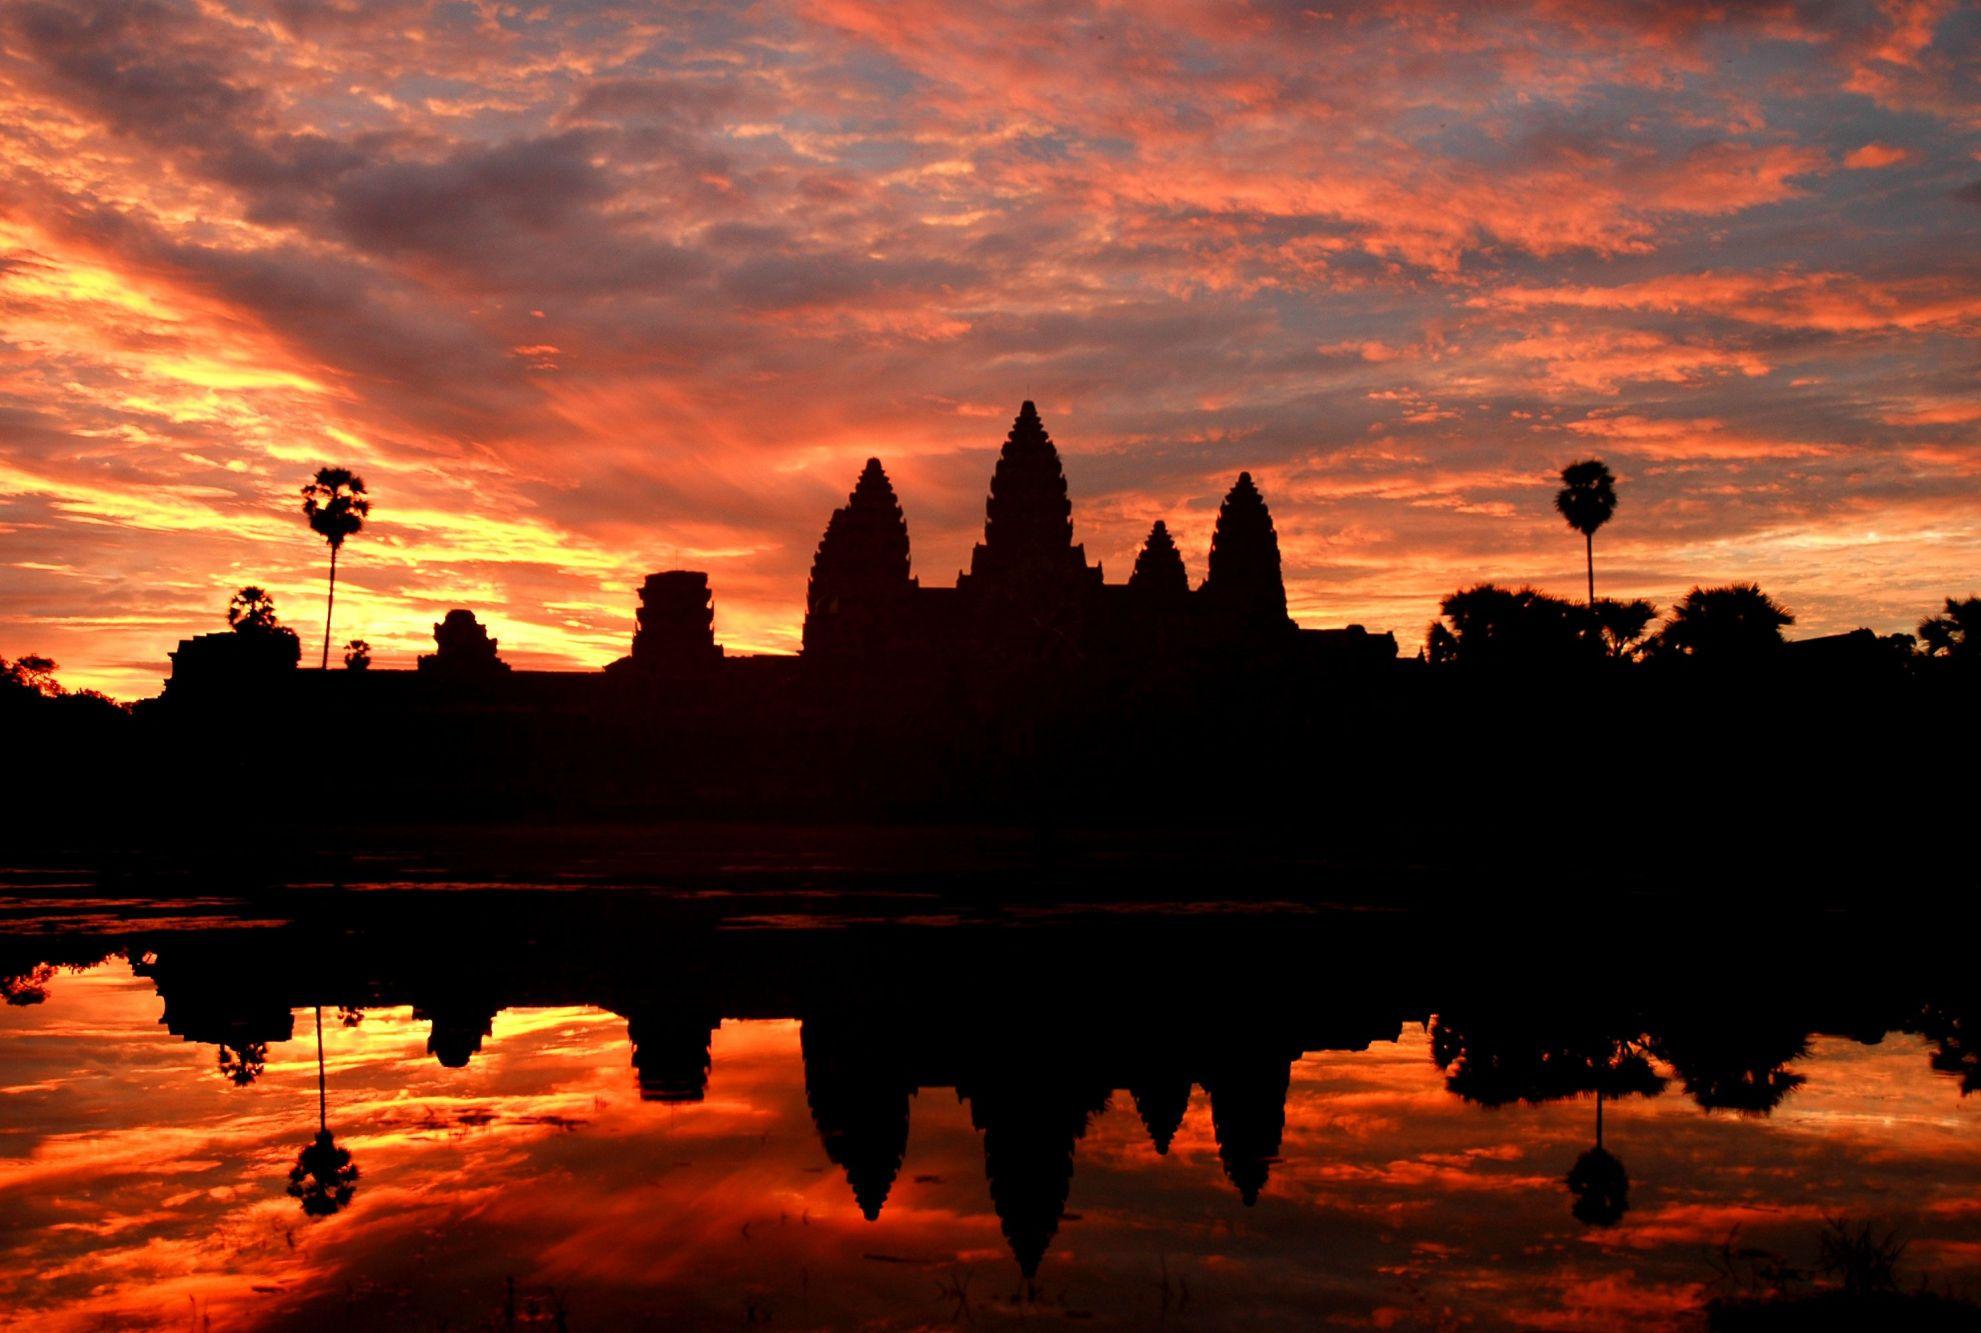 Fond d 39 cran cambodge maximumwall for Fond ecran hd 2016